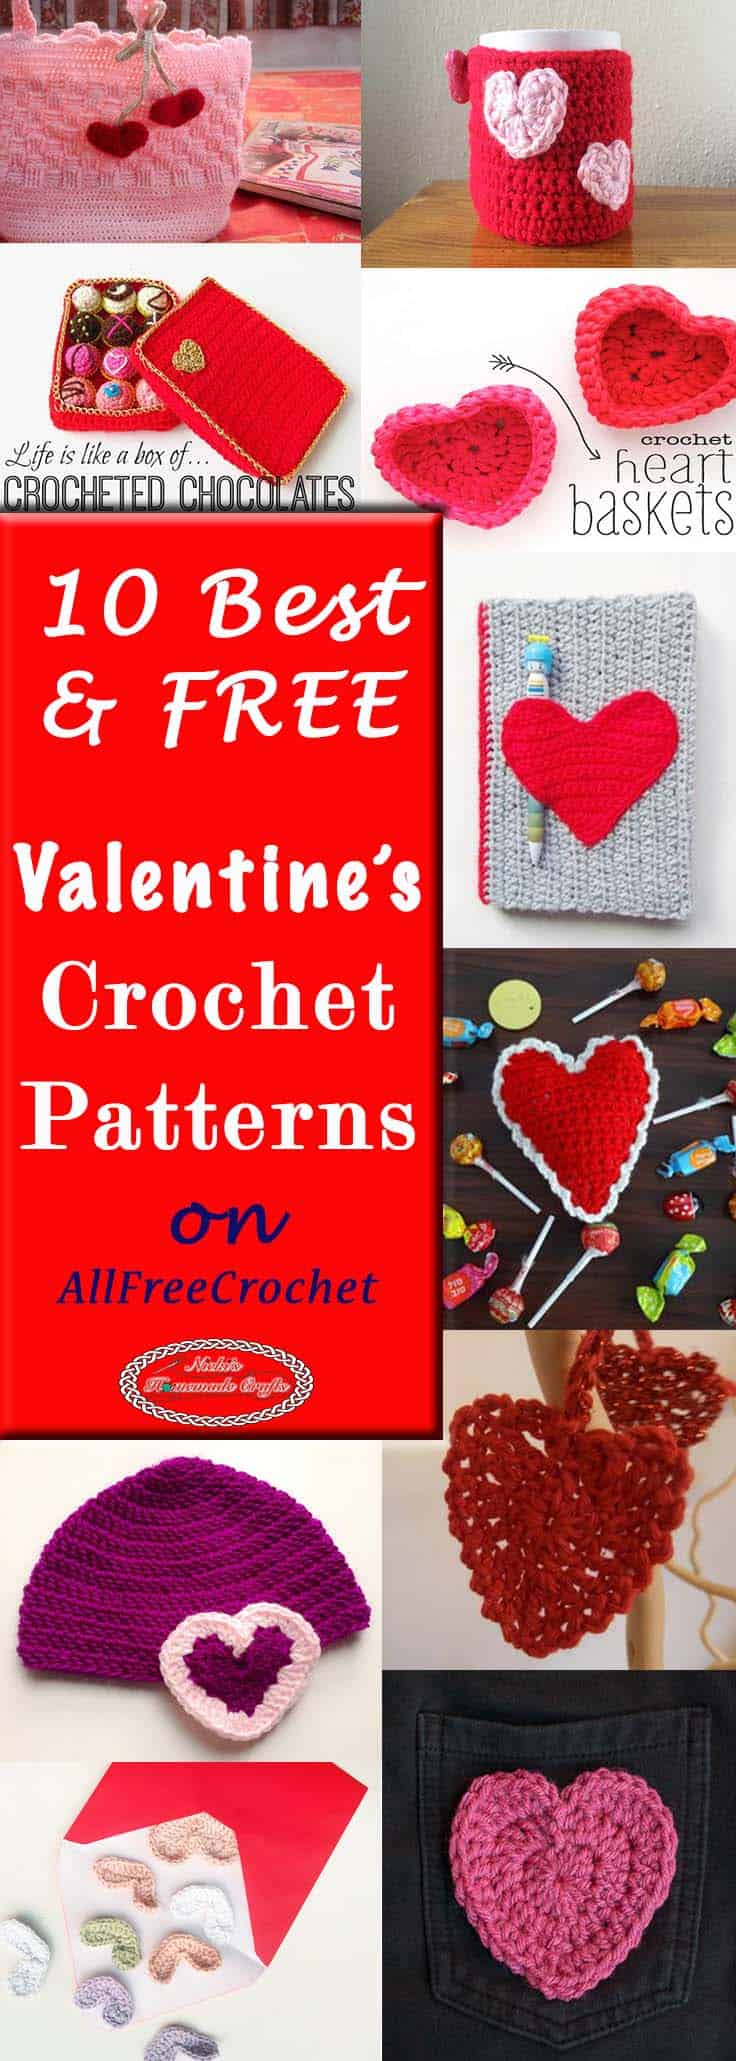 10 best free valentines crochet pattern on allfreecrochet by nickis homemade crafts free crochet - Free Valentines